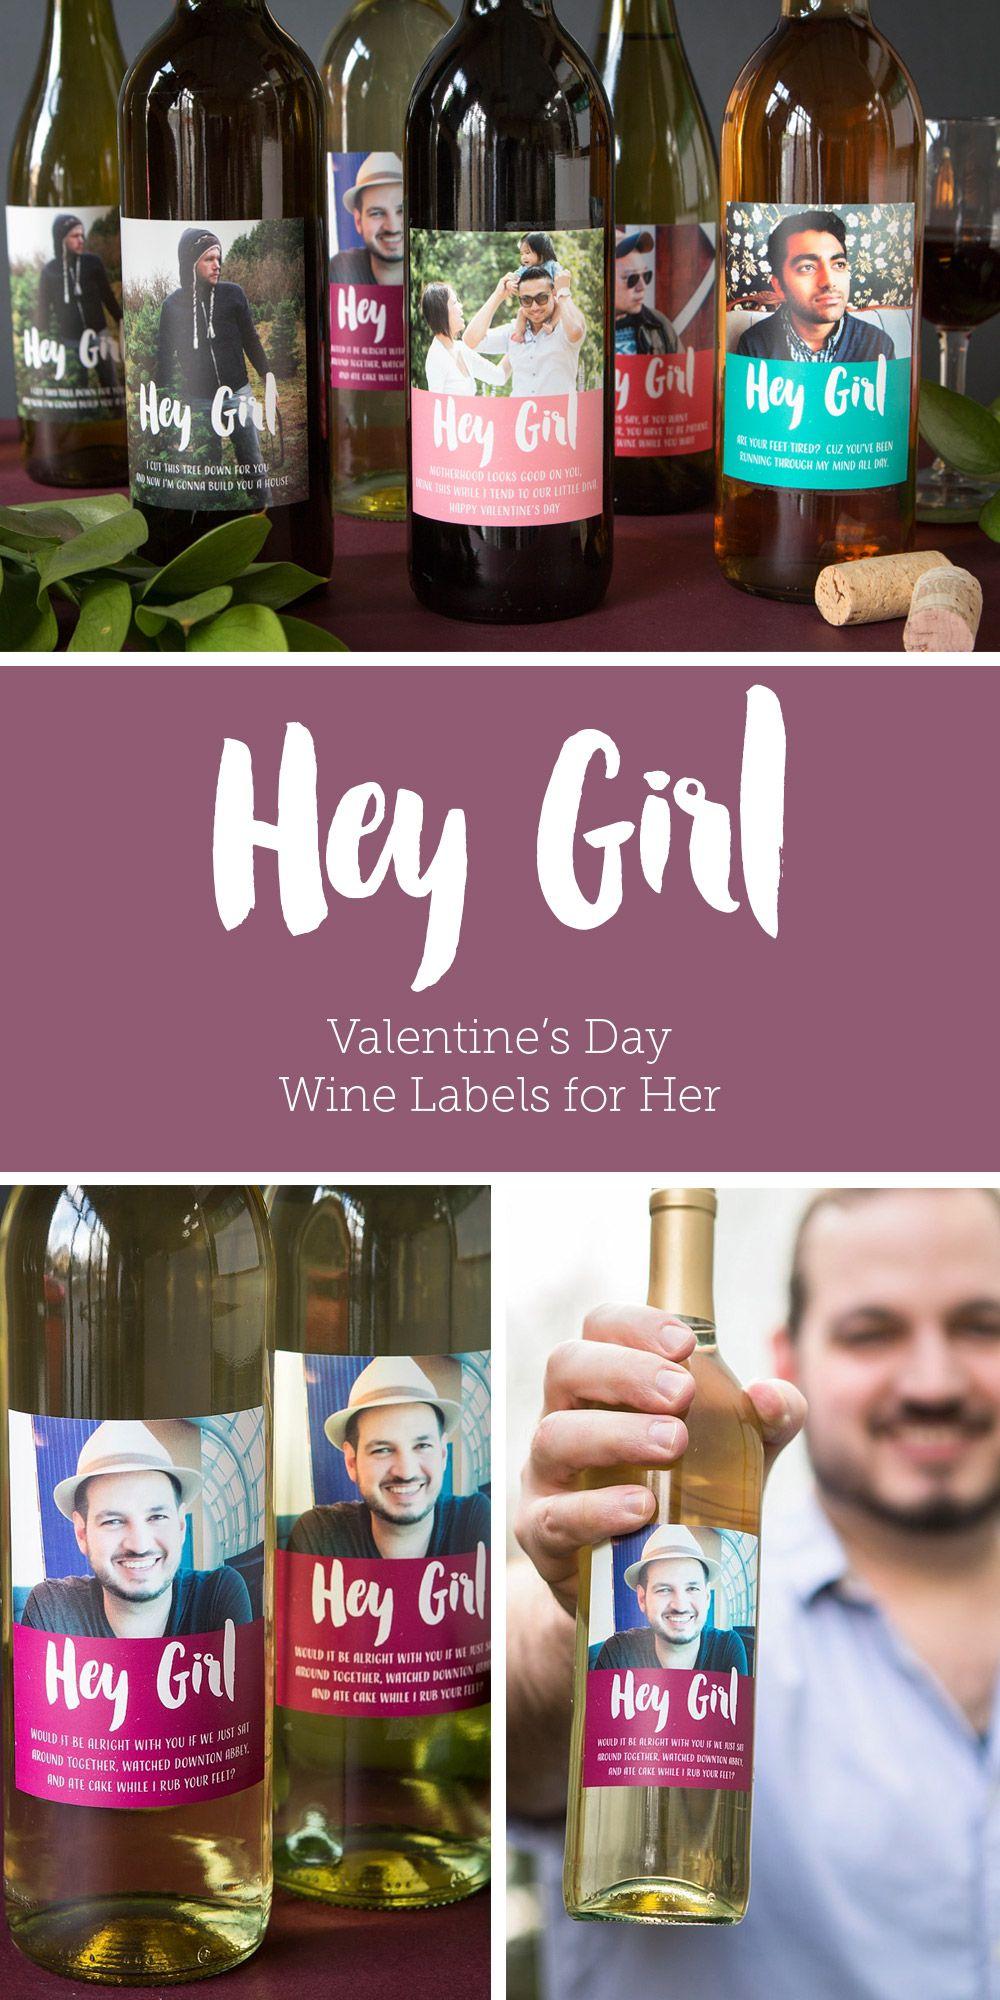 Hey Girl Ryan Gosling Meme Spoof Valentines Day Wine Labels